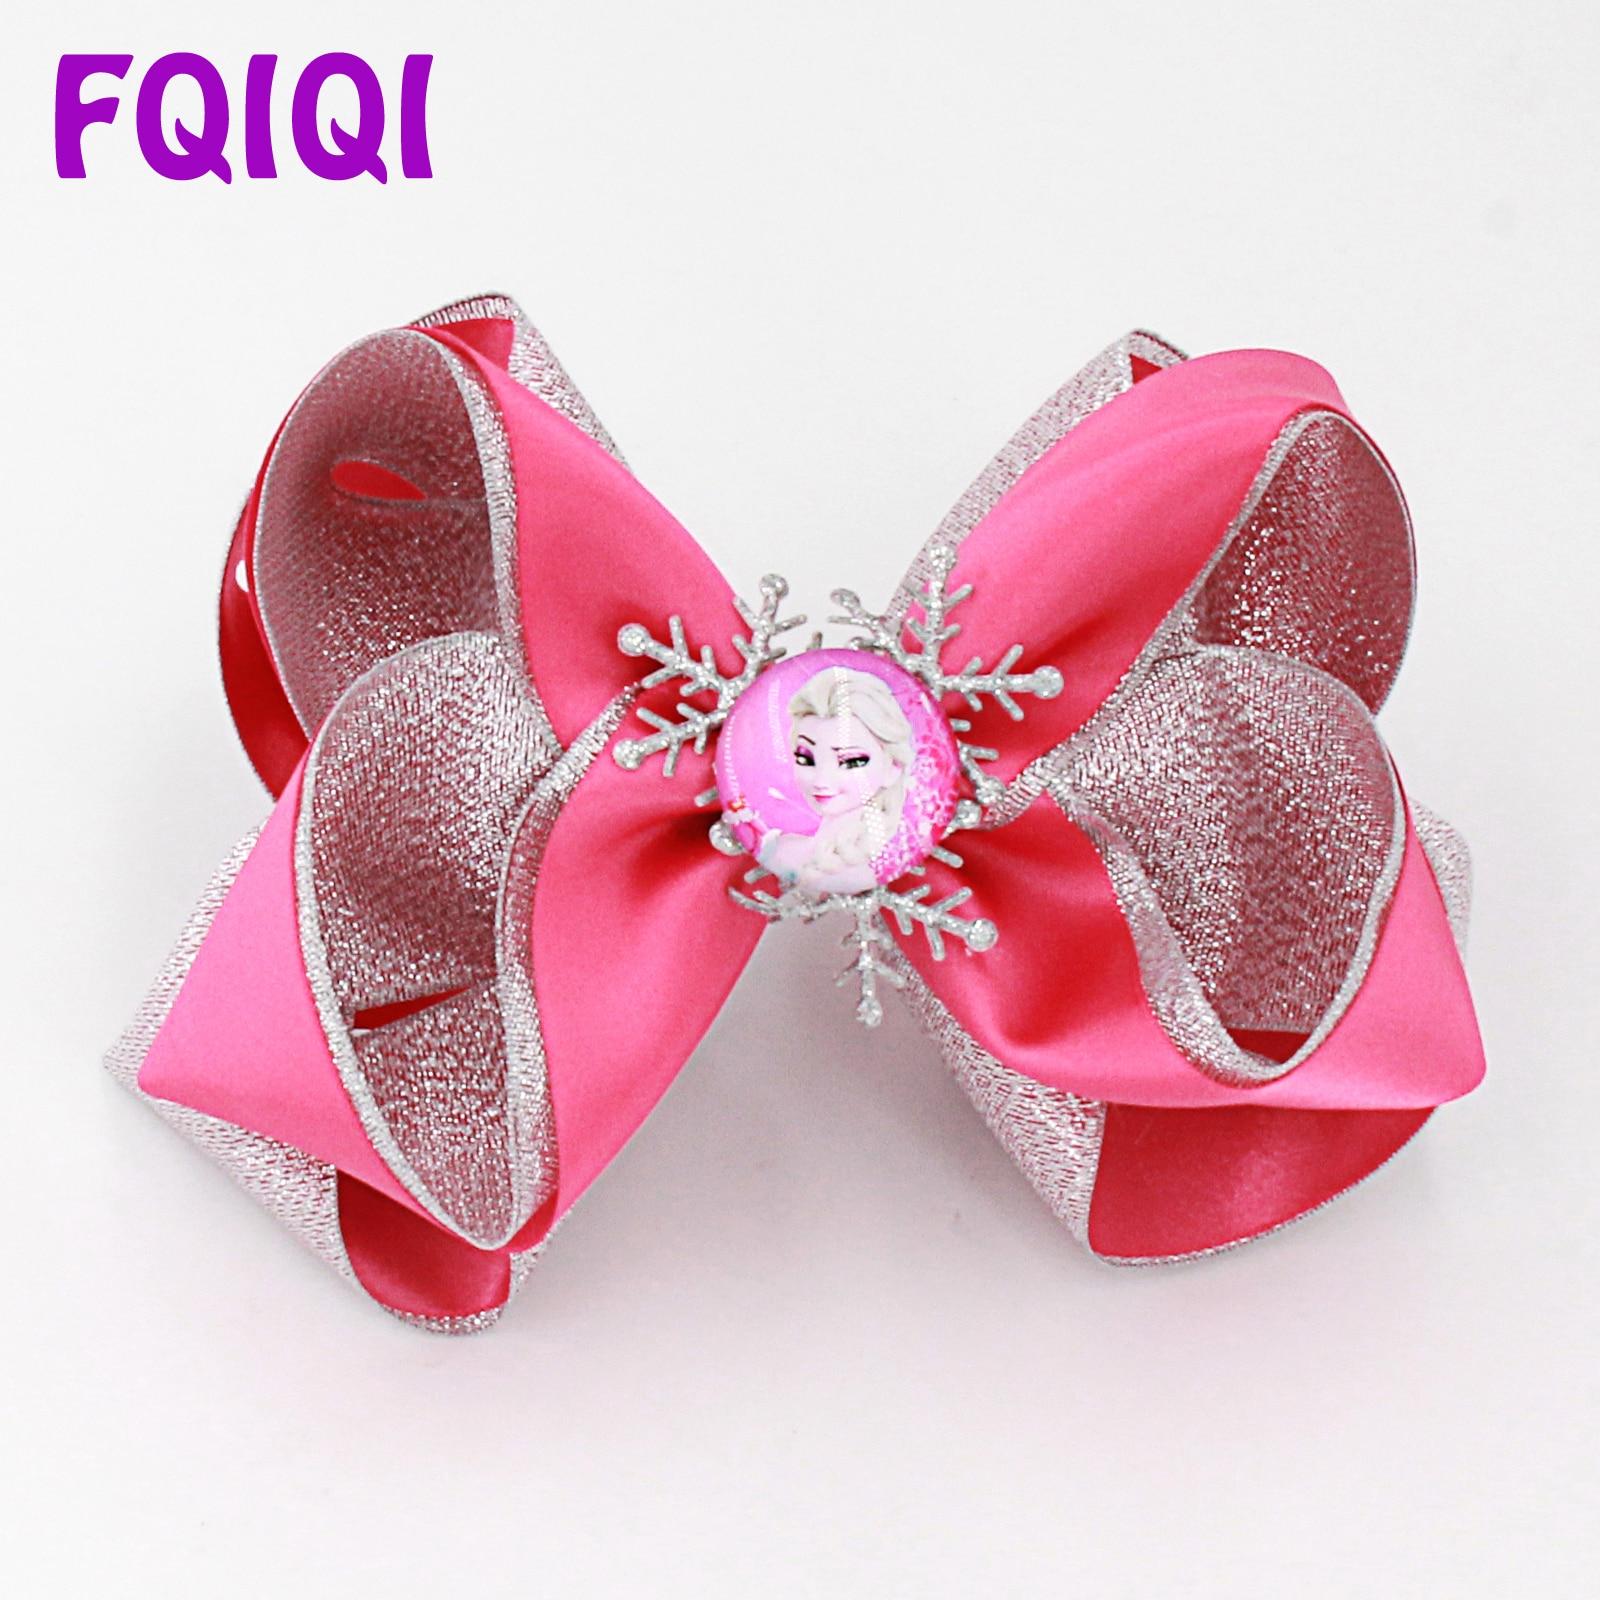 Hair Bows Ladies Girls Diamond Dance Alligator Clips Ribbons Pins Accessories